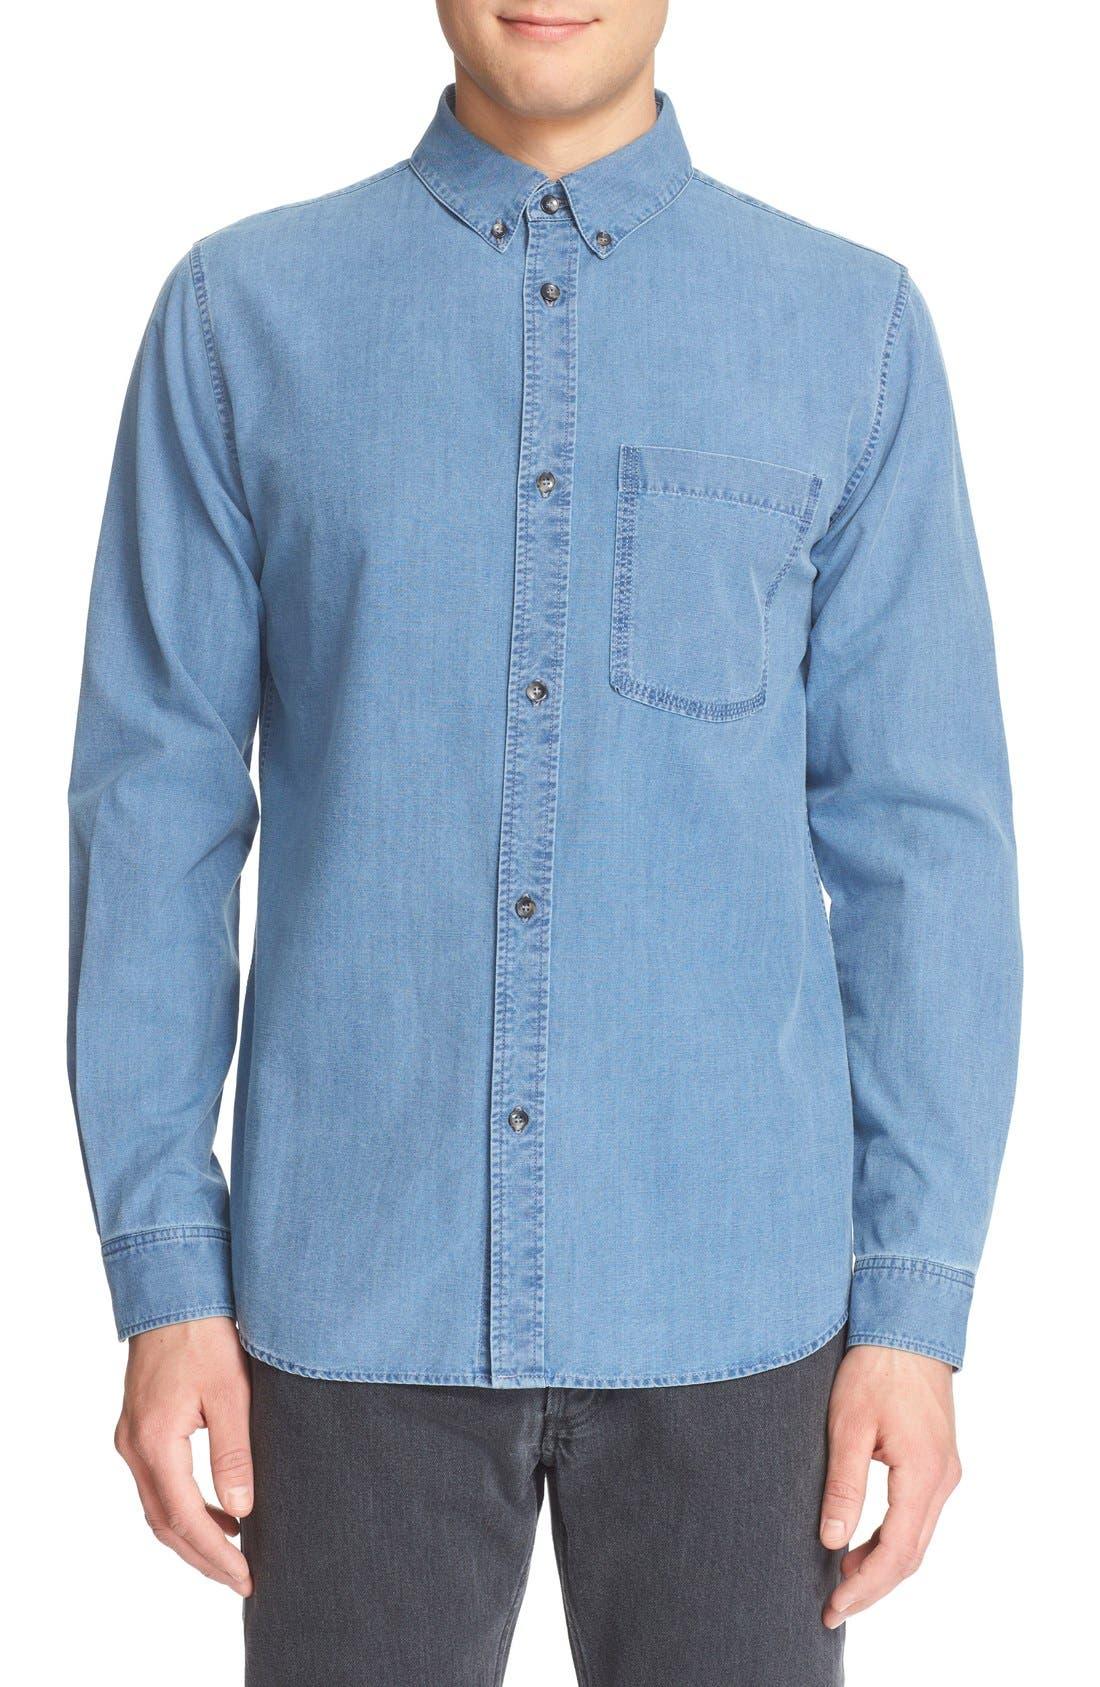 A.P.C. 'Clift' Long Sleeve Chambray Shirt